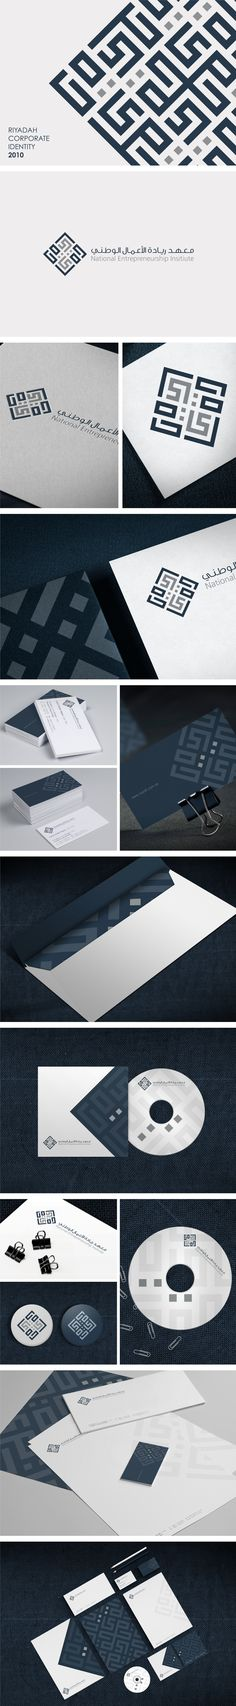 Riyadah Identity // Branding by Mohd Almousa, via Behance  #stationary #corporate #design #corporatedesign #logo #identity #branding #marketing <<< repinned by an #advertising agency from #Hamburg / #Germany - www.BlickeDeeler.de